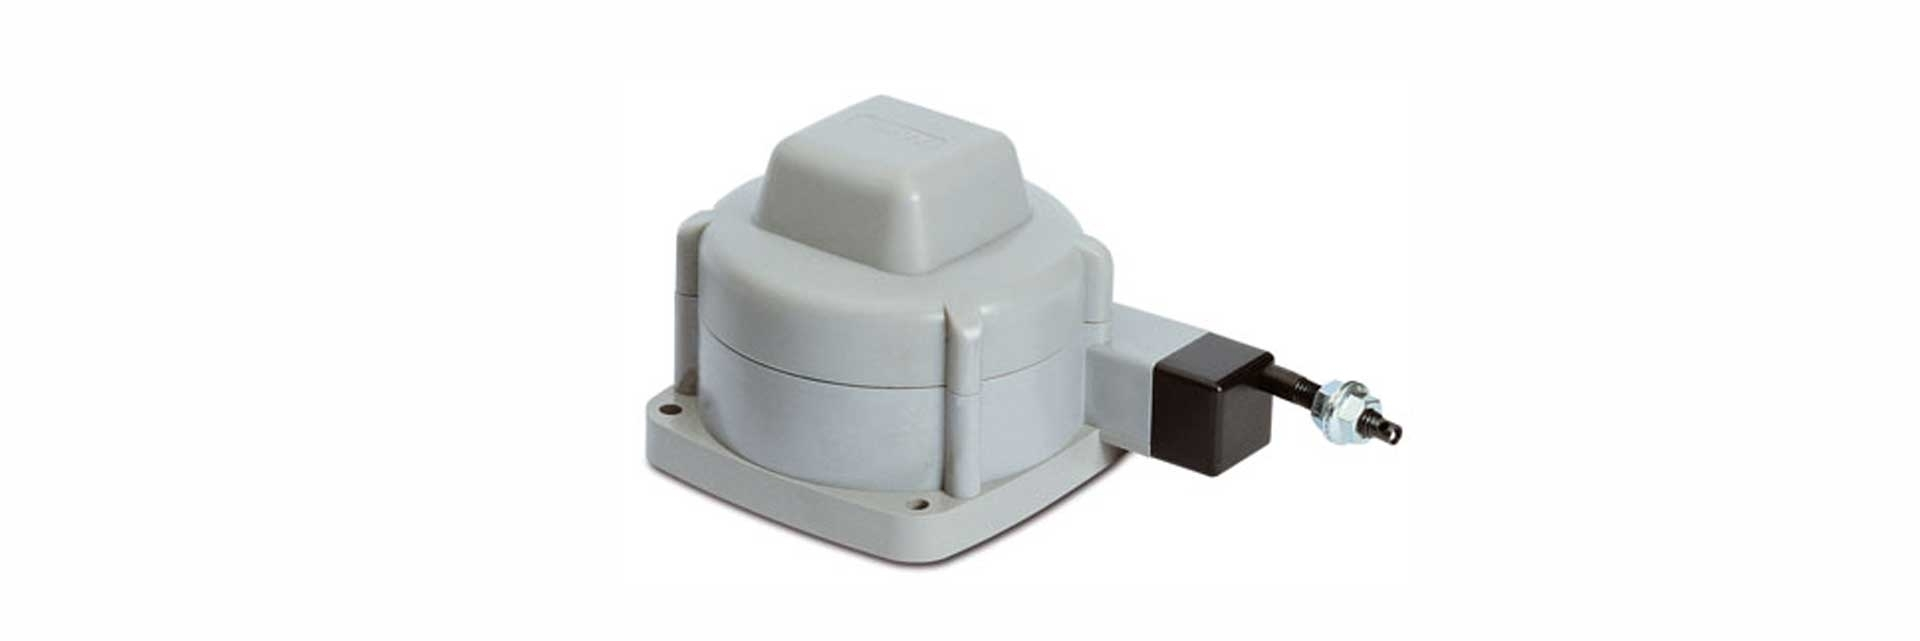 Draw-wire encoder | precise measurement ✓ Willtec measuring ...